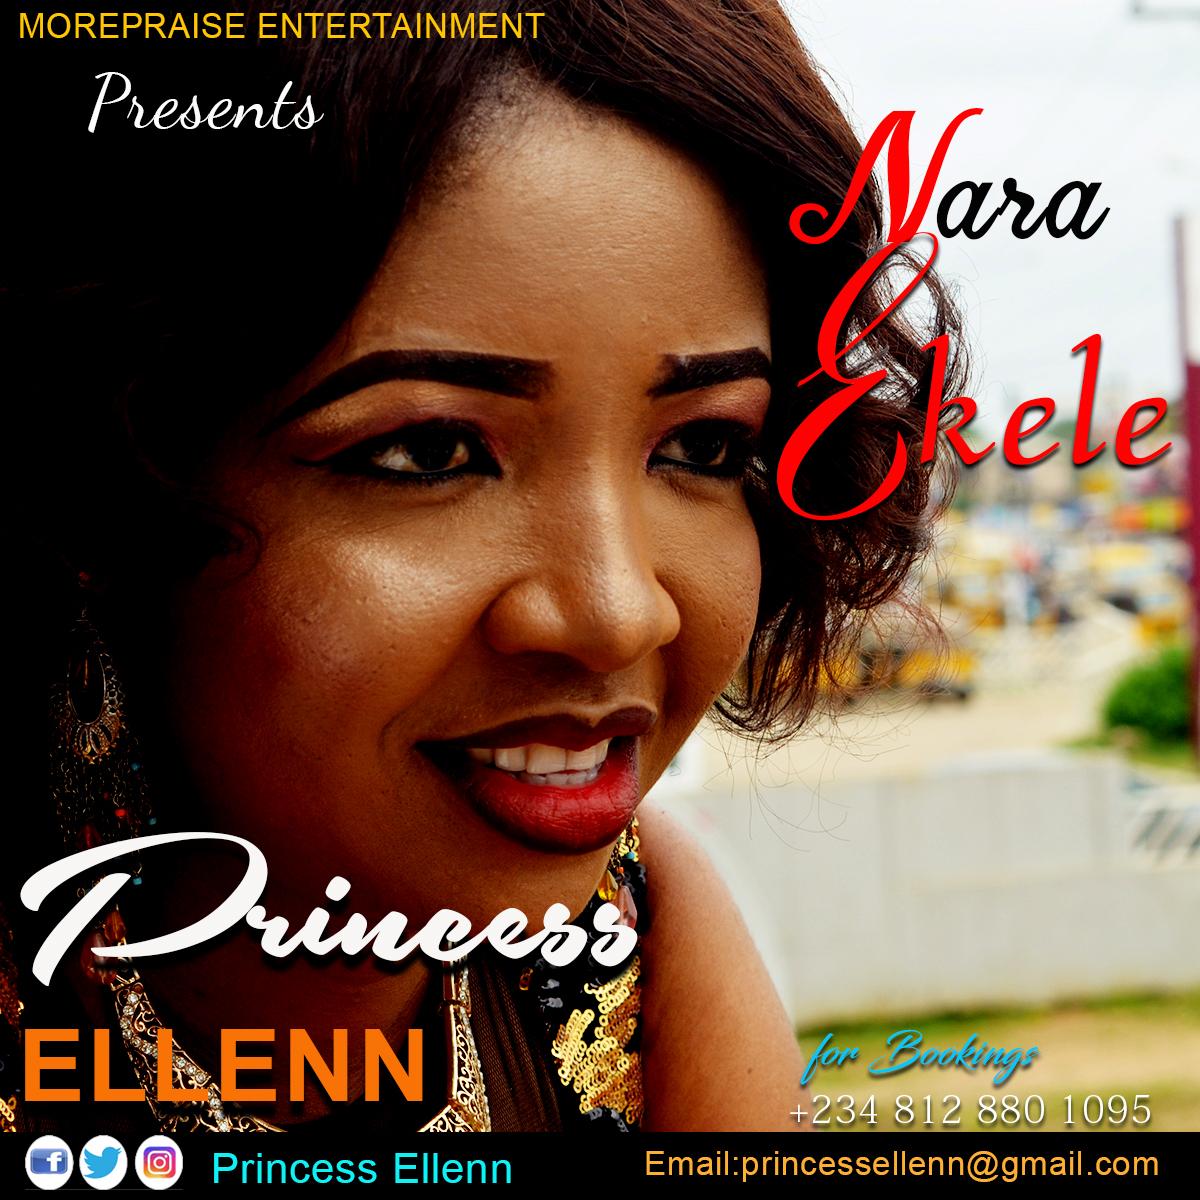 Princess Ellenn - Nara Ekele